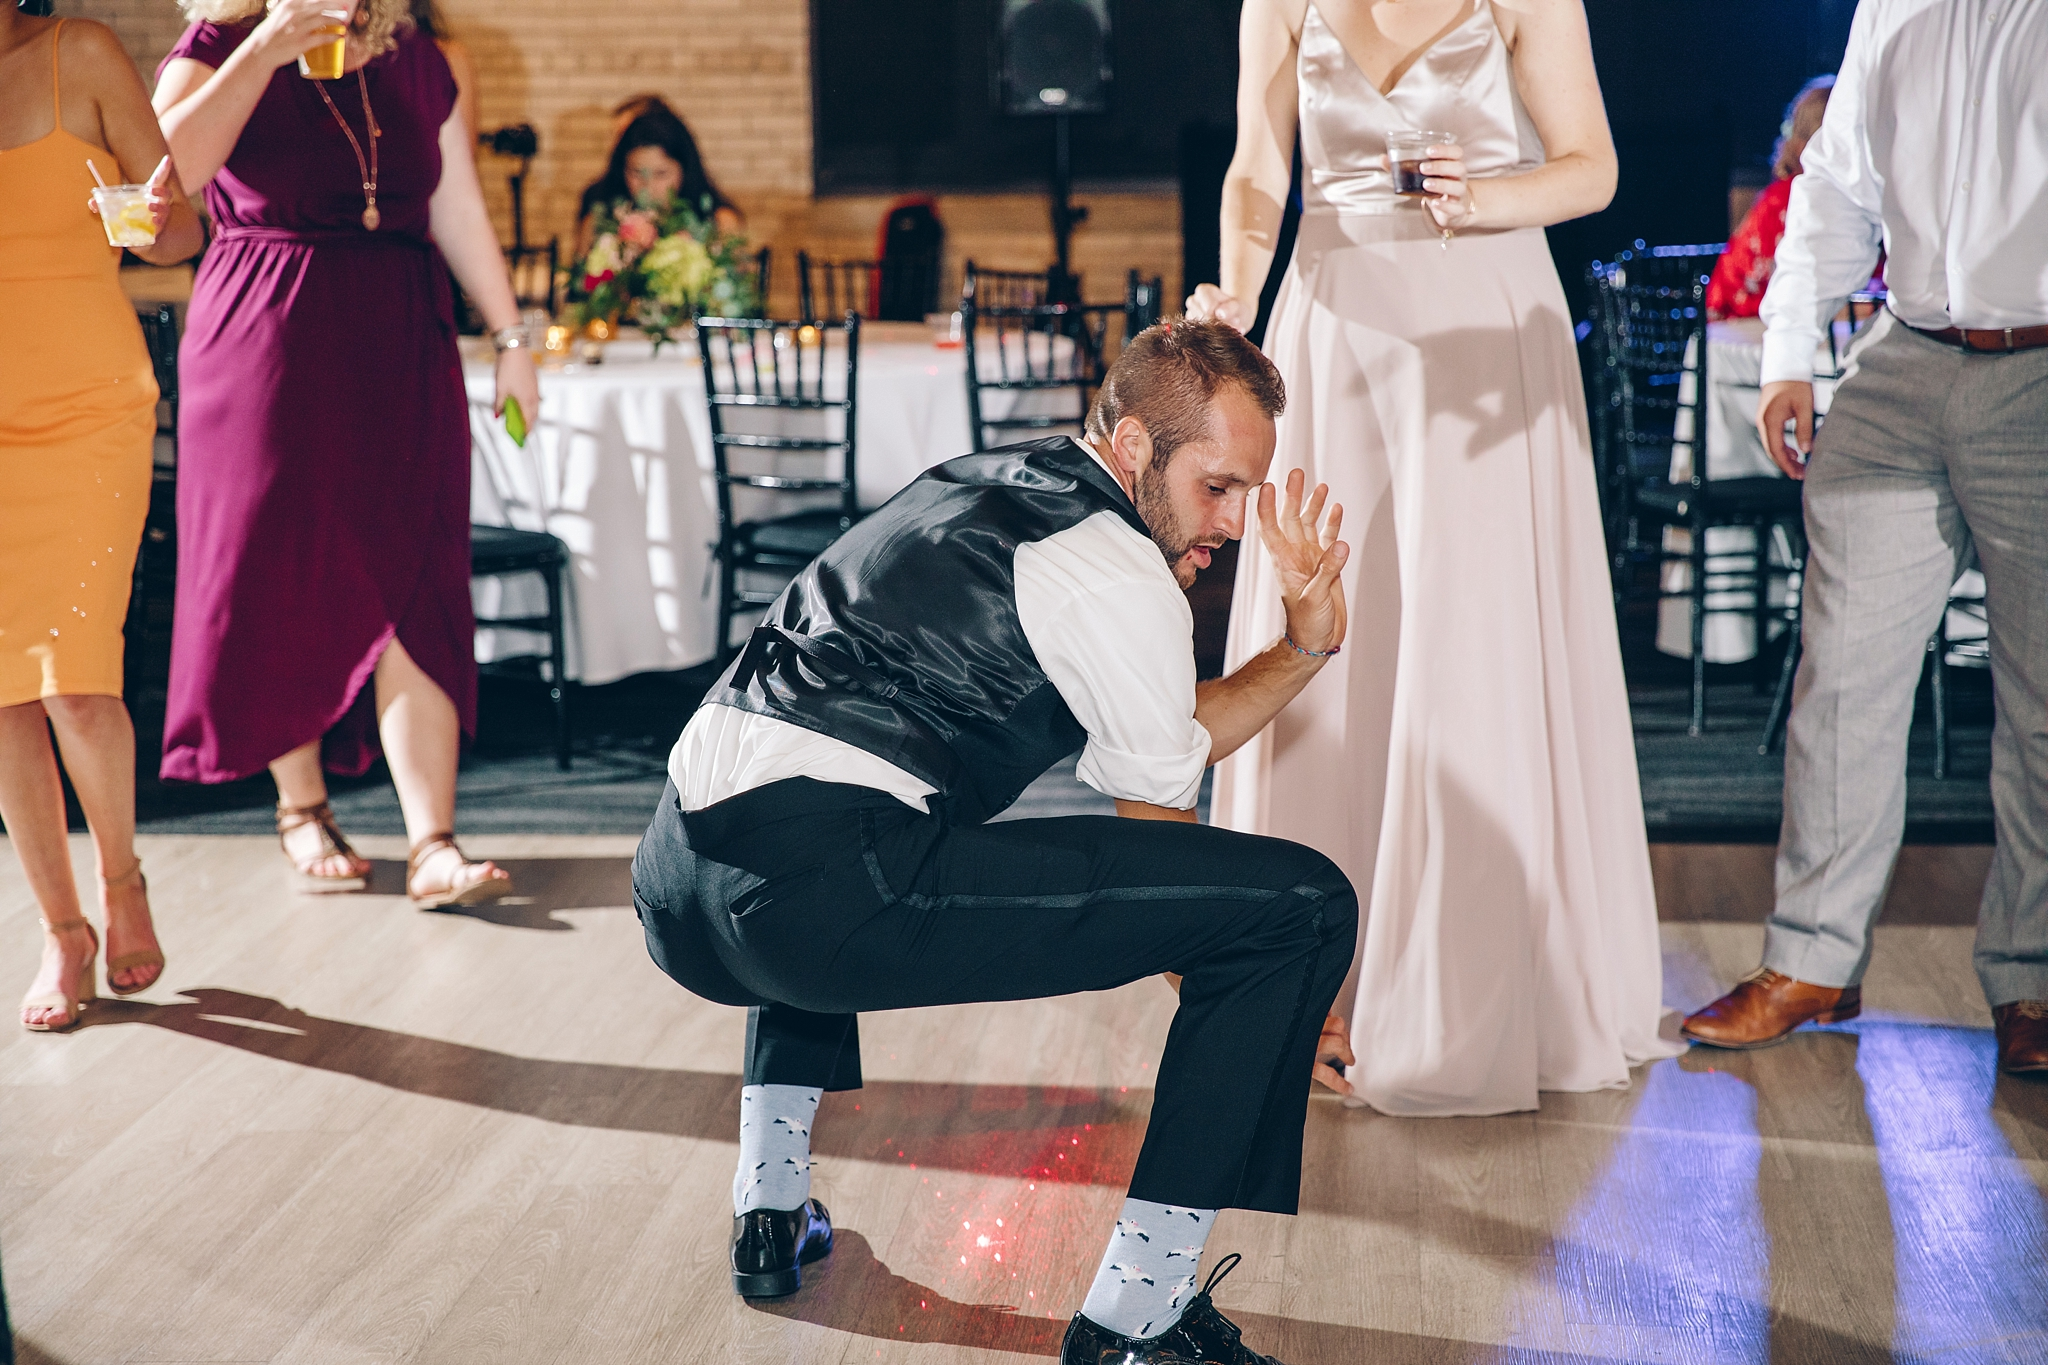 baker-lofts-holland-michigan-wedding-photographer_0410.jpg